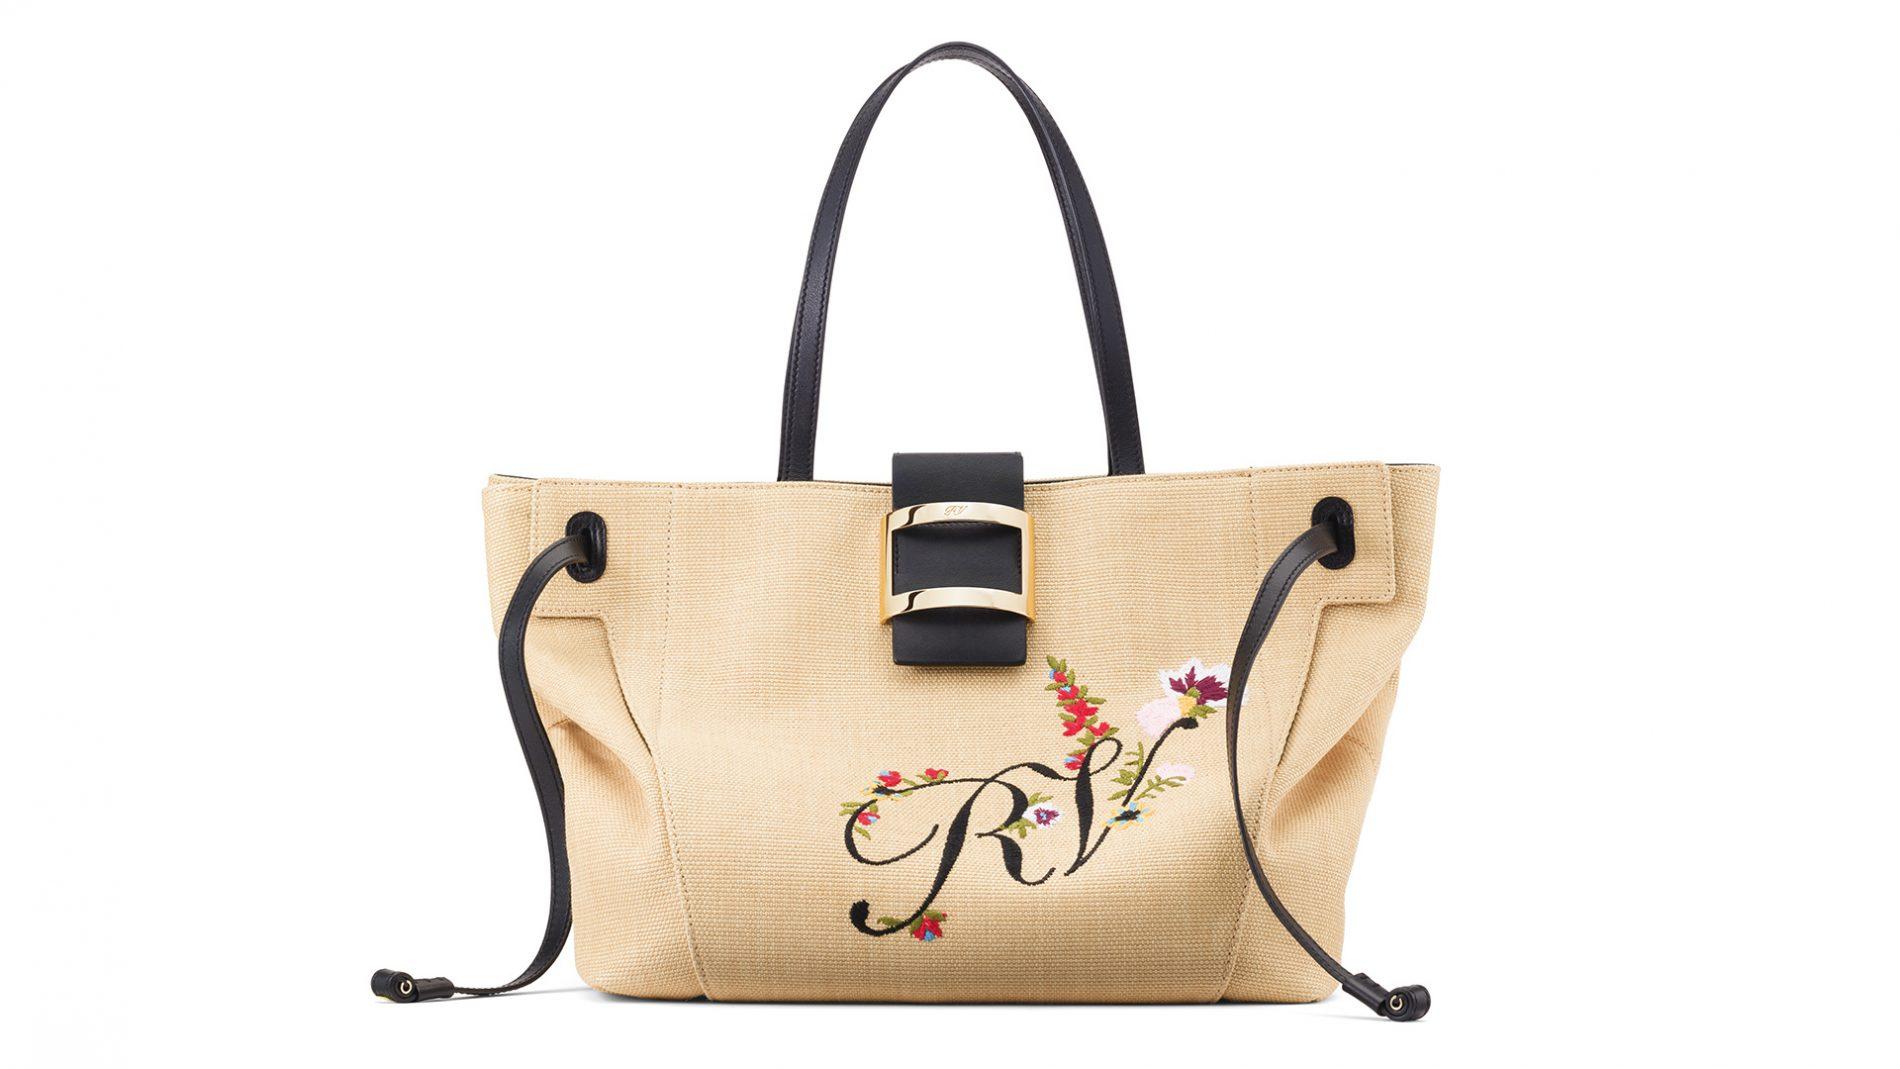 El Corte Inglés Designer Handbags Roger Vivier Shopper